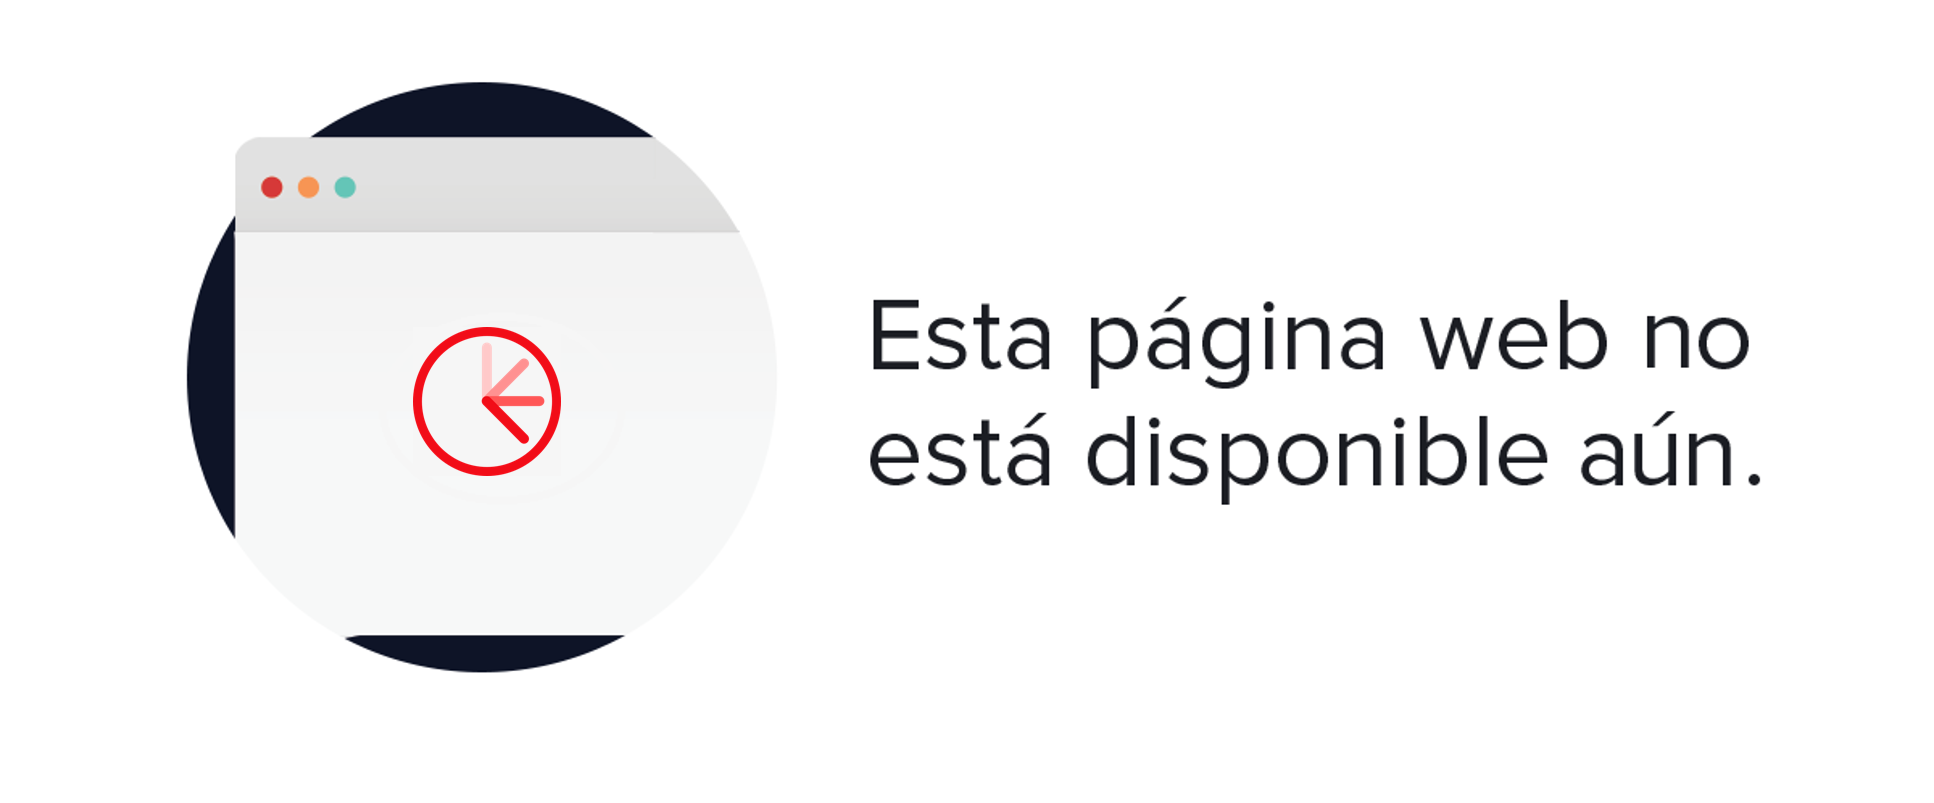 Easy Wear - Pantalón jogging de mujer Easy Wear de felpa Negro 001041565400953001 - FBZWZPQ